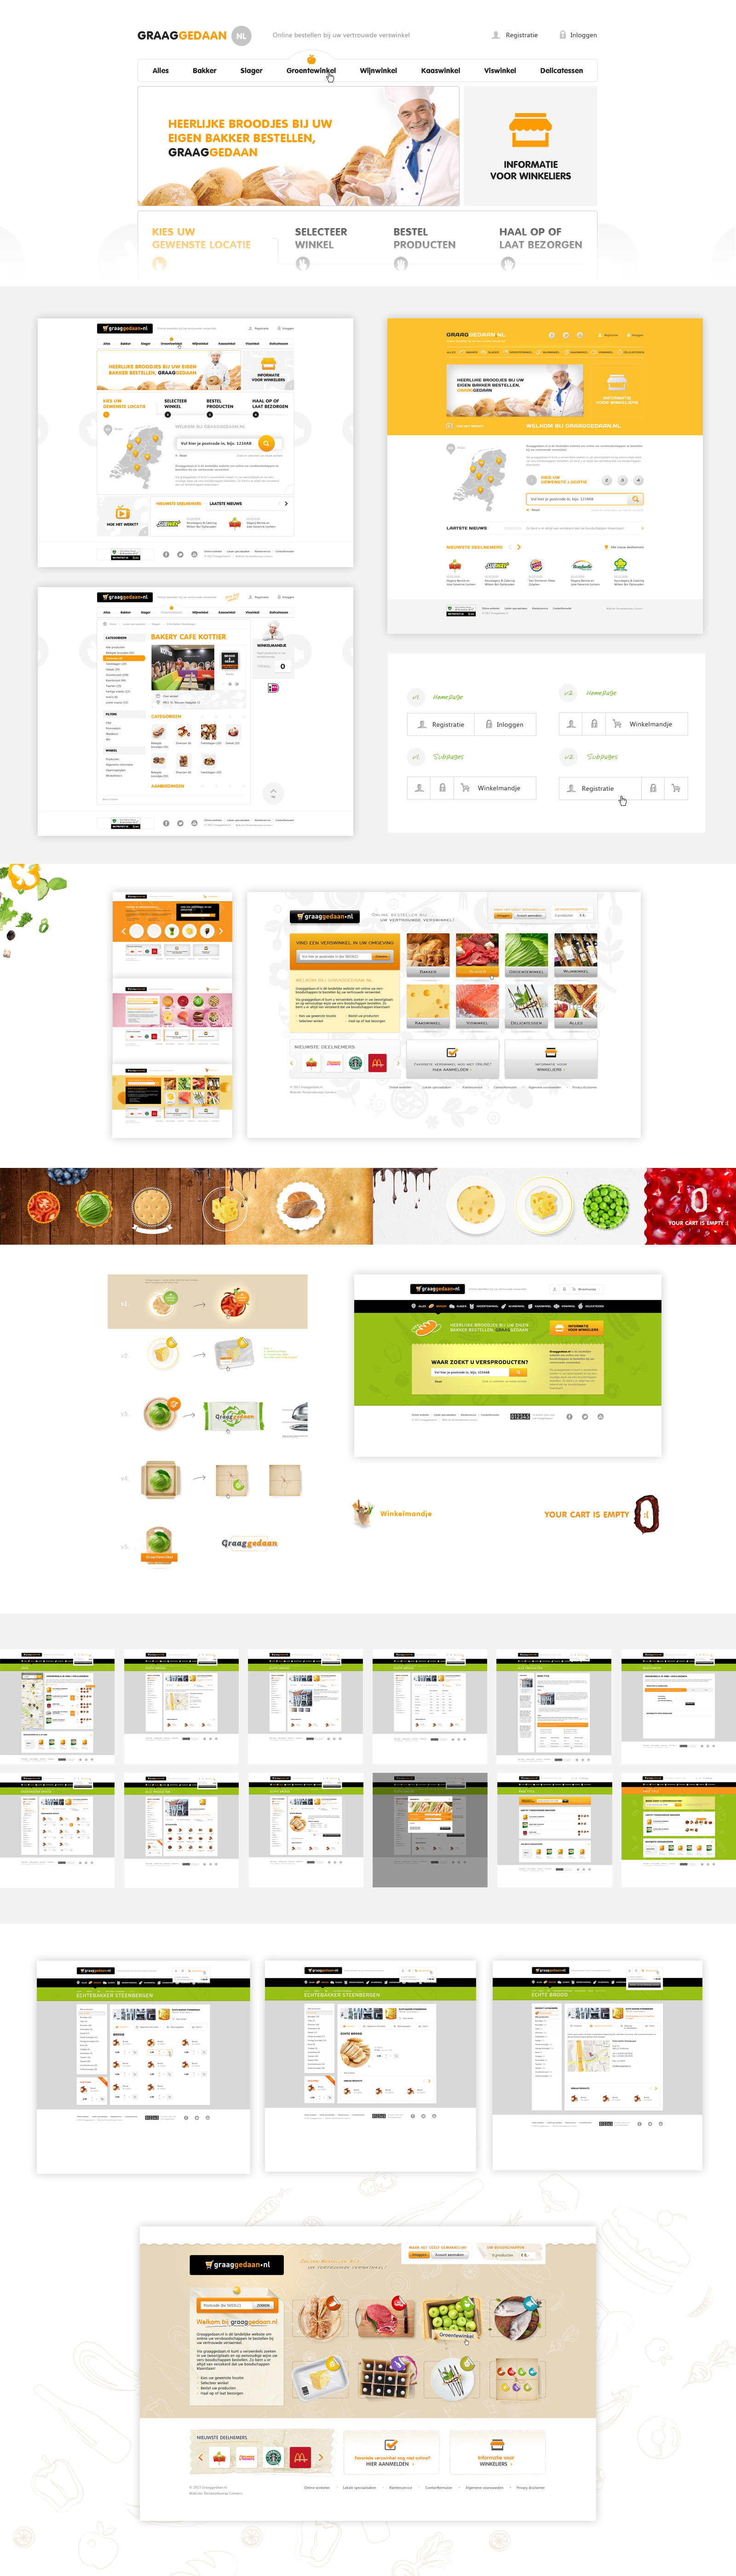 Каталог пищевых компаний